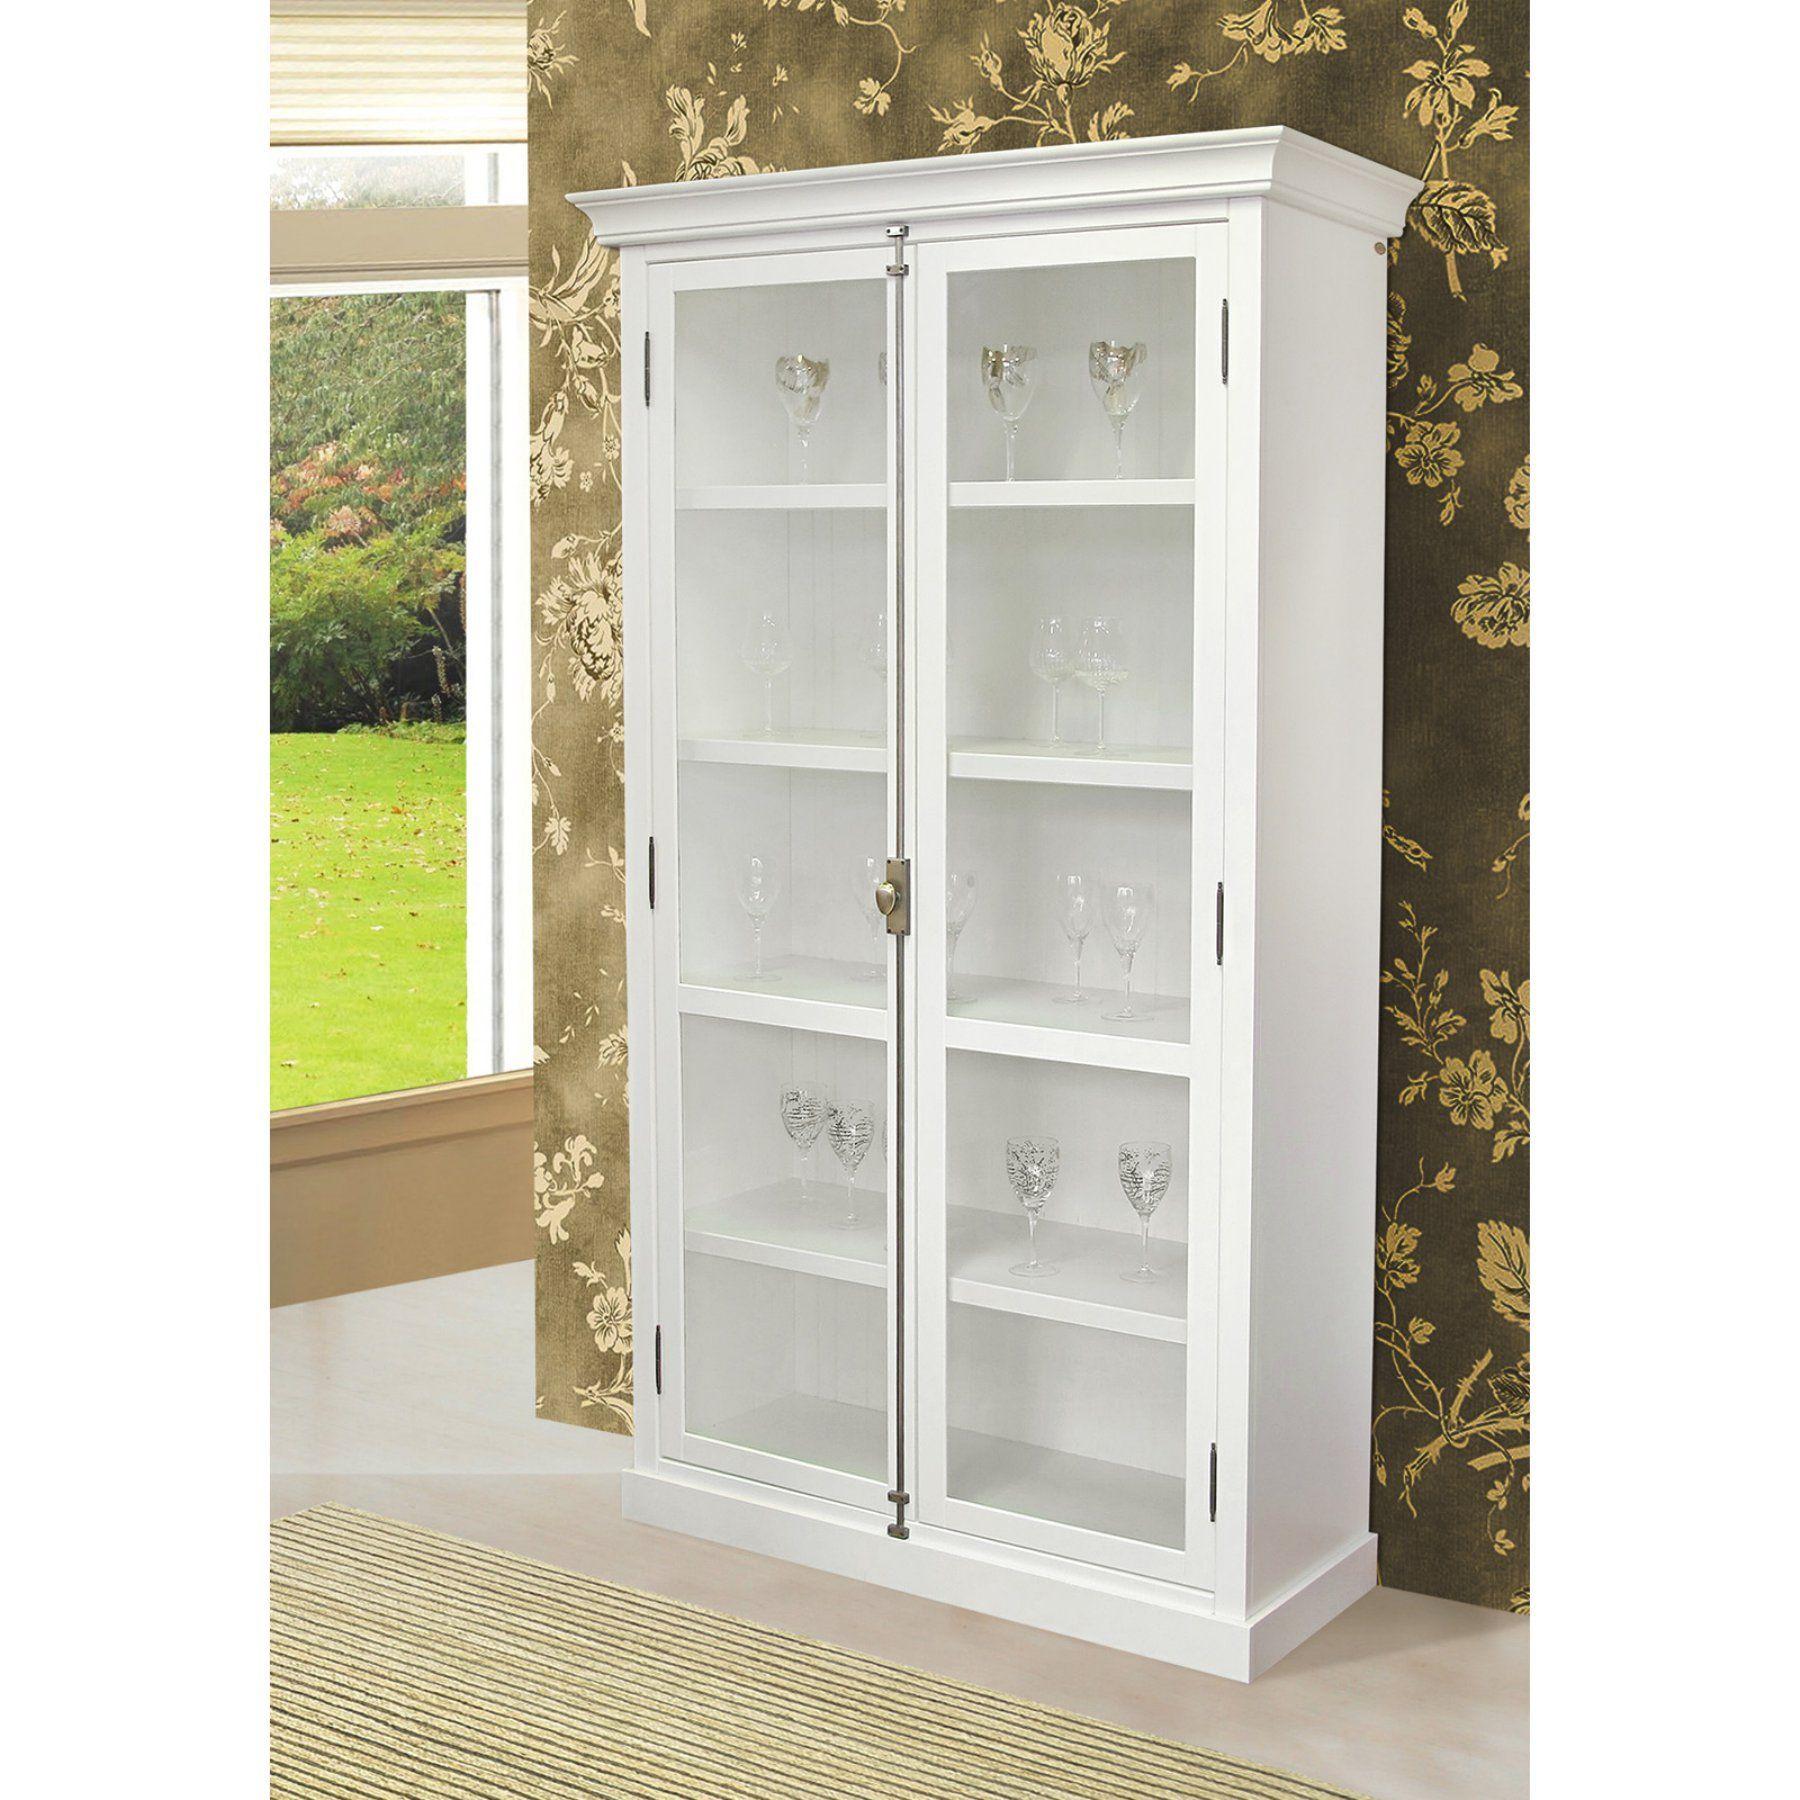 Artefama Cast Display Cabinet White 6067 0001